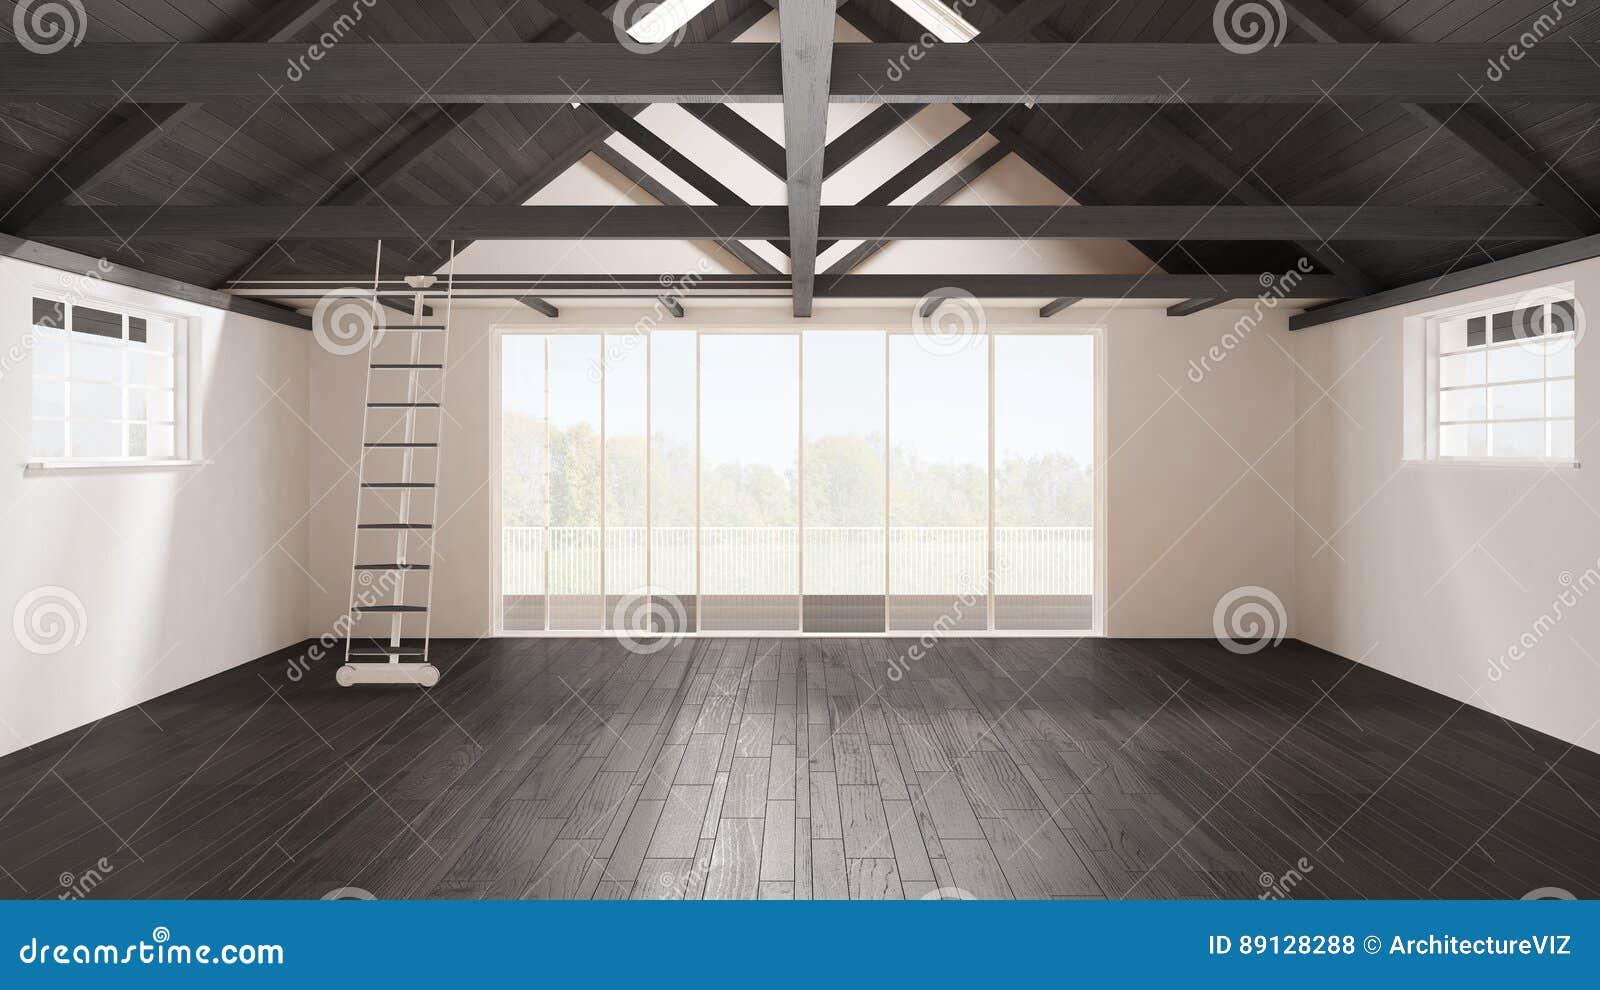 Minimalist Mezzanine Loft Empty Industrial Space Wooden Roofin